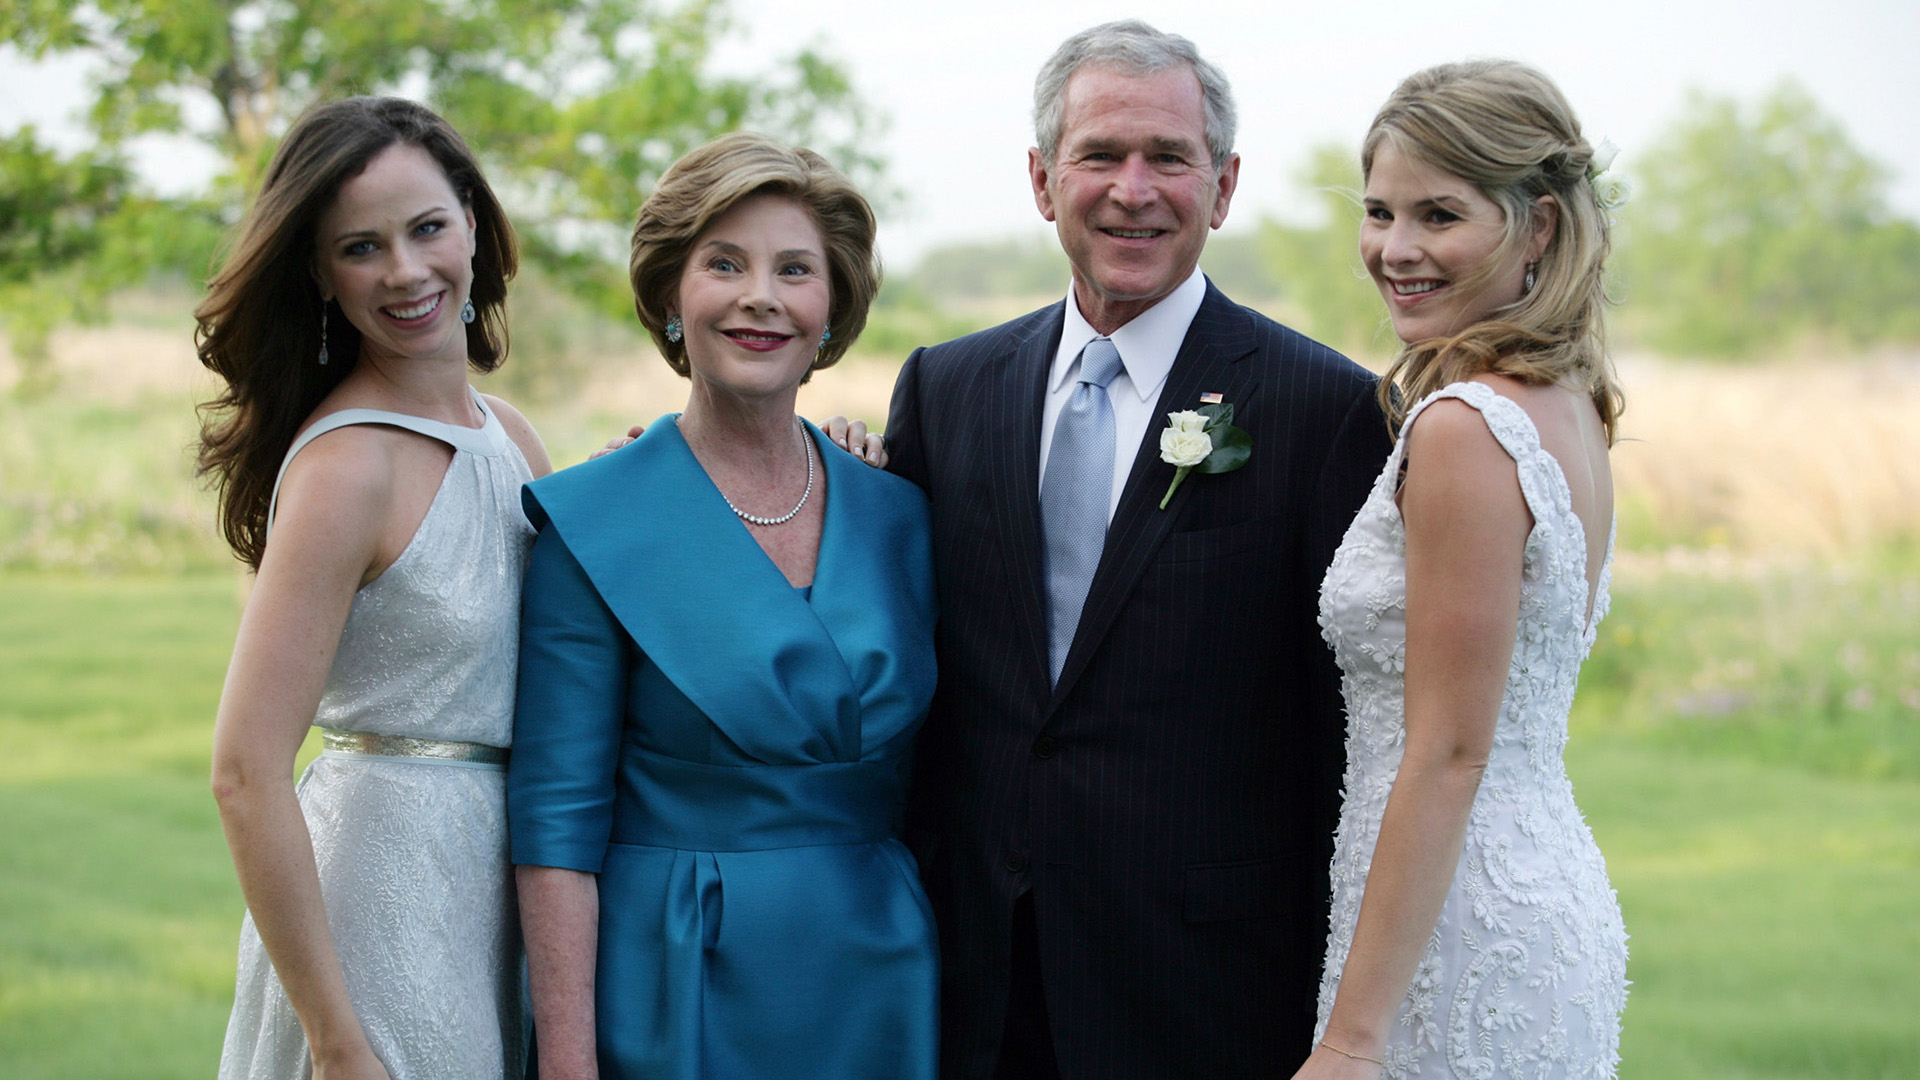 George W. és Laura Bush lányai: Barbara, Jenna